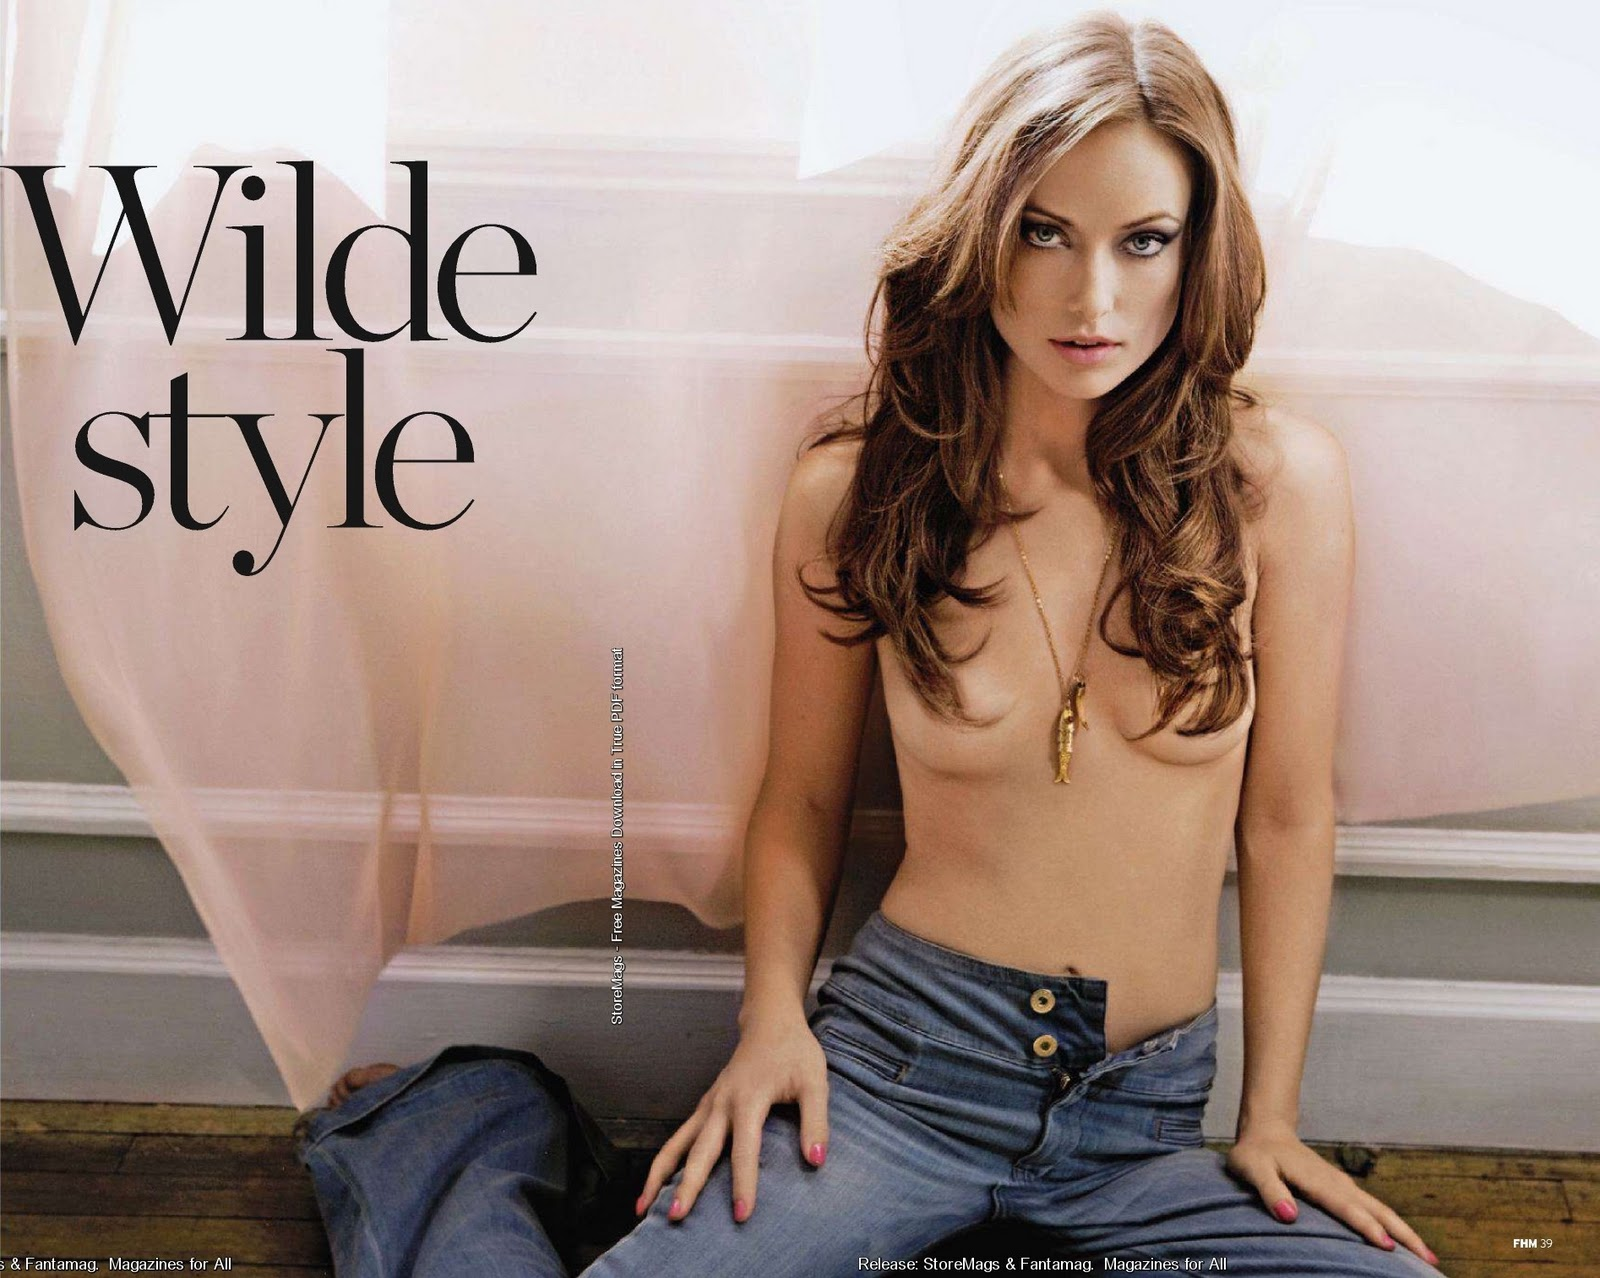 http://3.bp.blogspot.com/_6O72kKZ1q80/TUUV6rif8jI/AAAAAAAAGmg/s7D-yhNBSiY/s1600/Olivia-Wilde+sexy.jpg